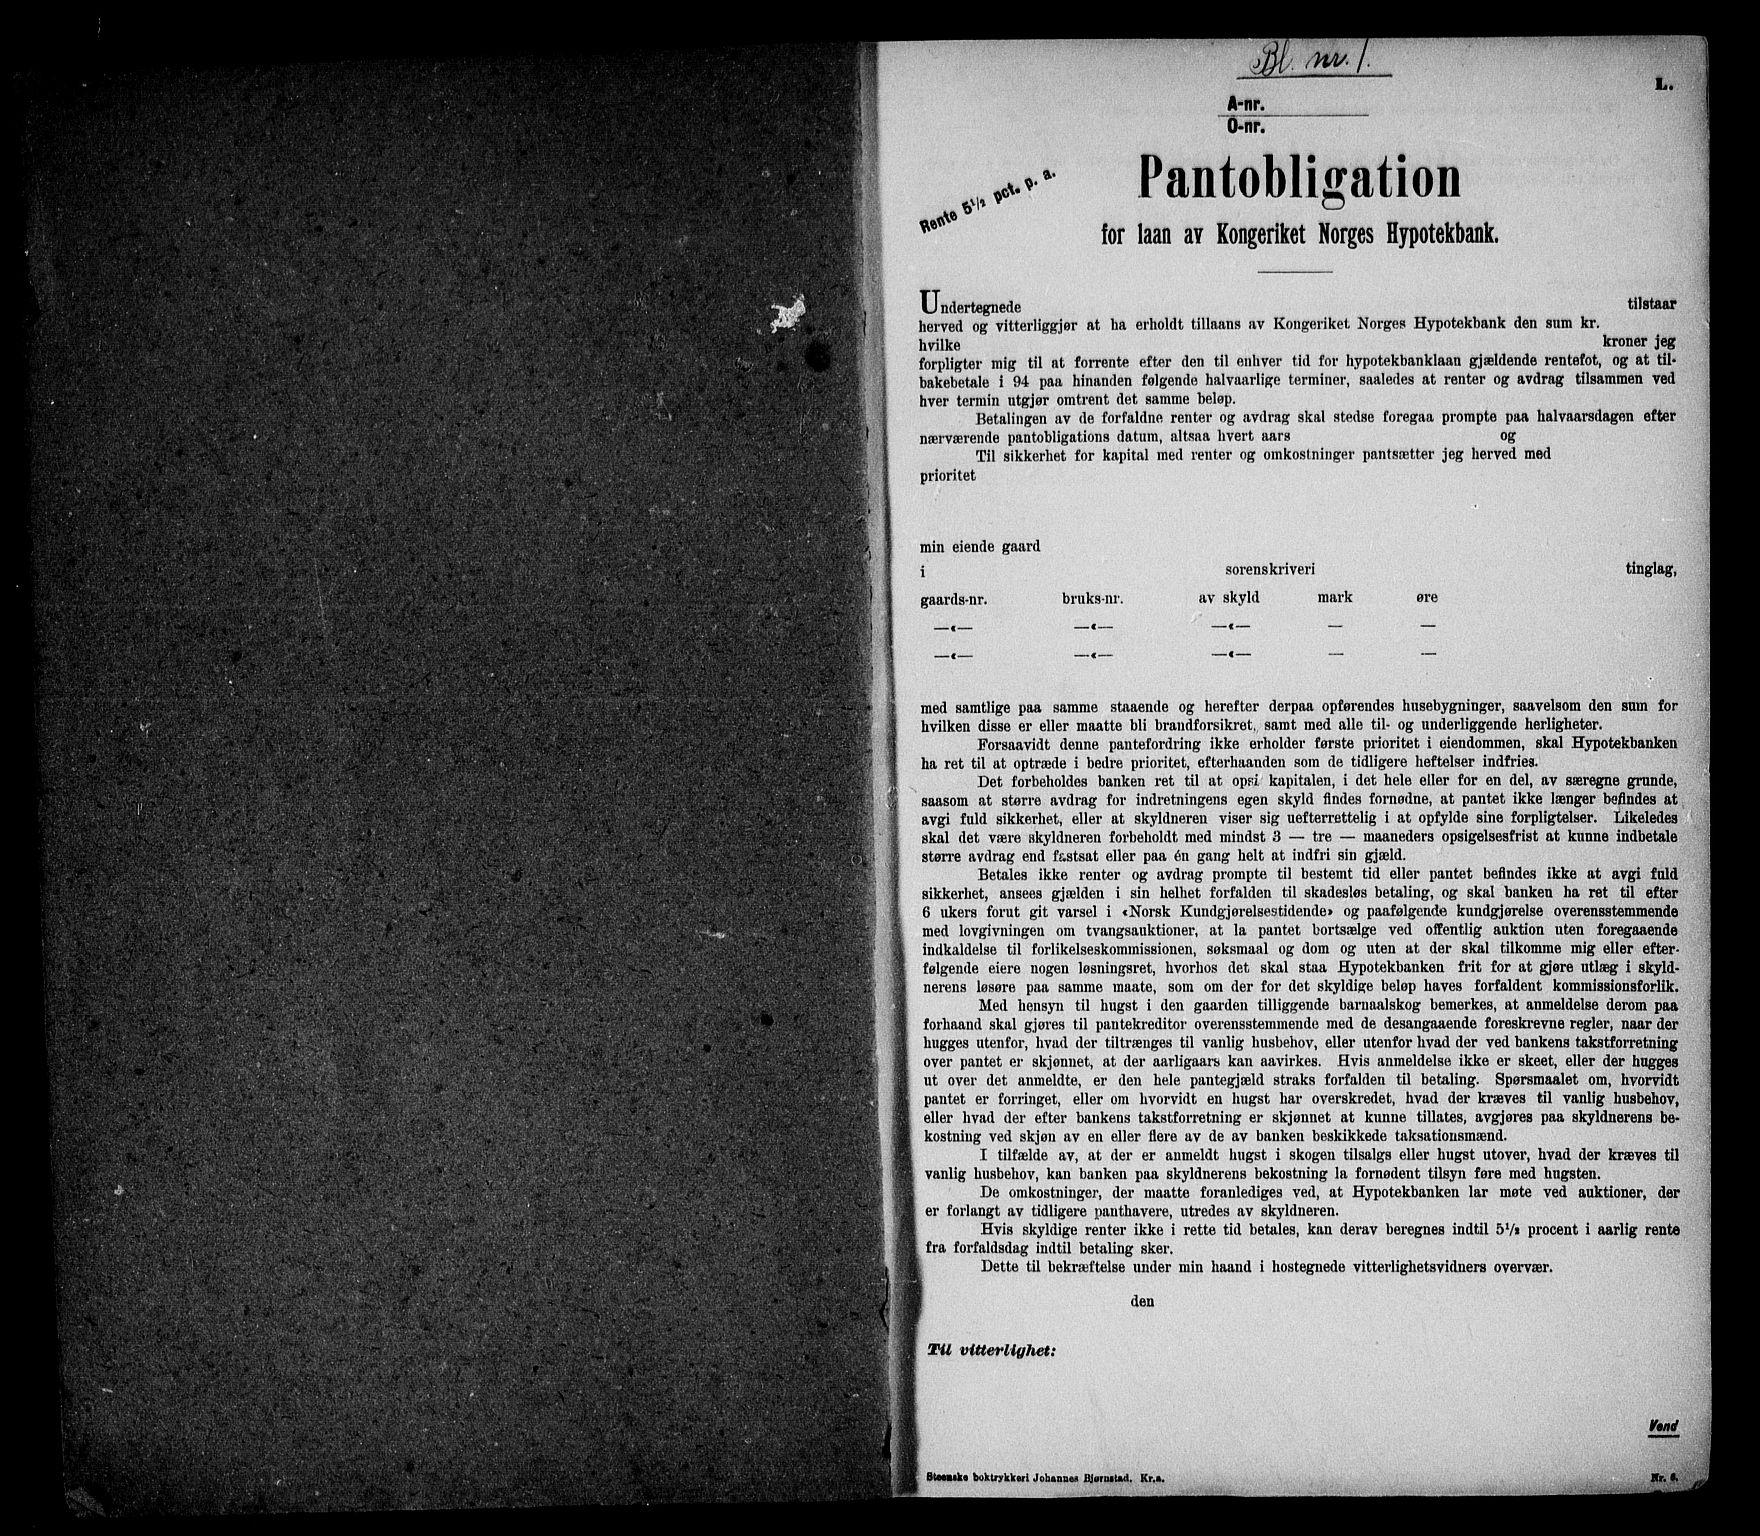 SAO, Onsøy sorenskriveri, G/Ga/Gaa/L0052: Pantebok nr. I 52, 1924-1925, s. 1